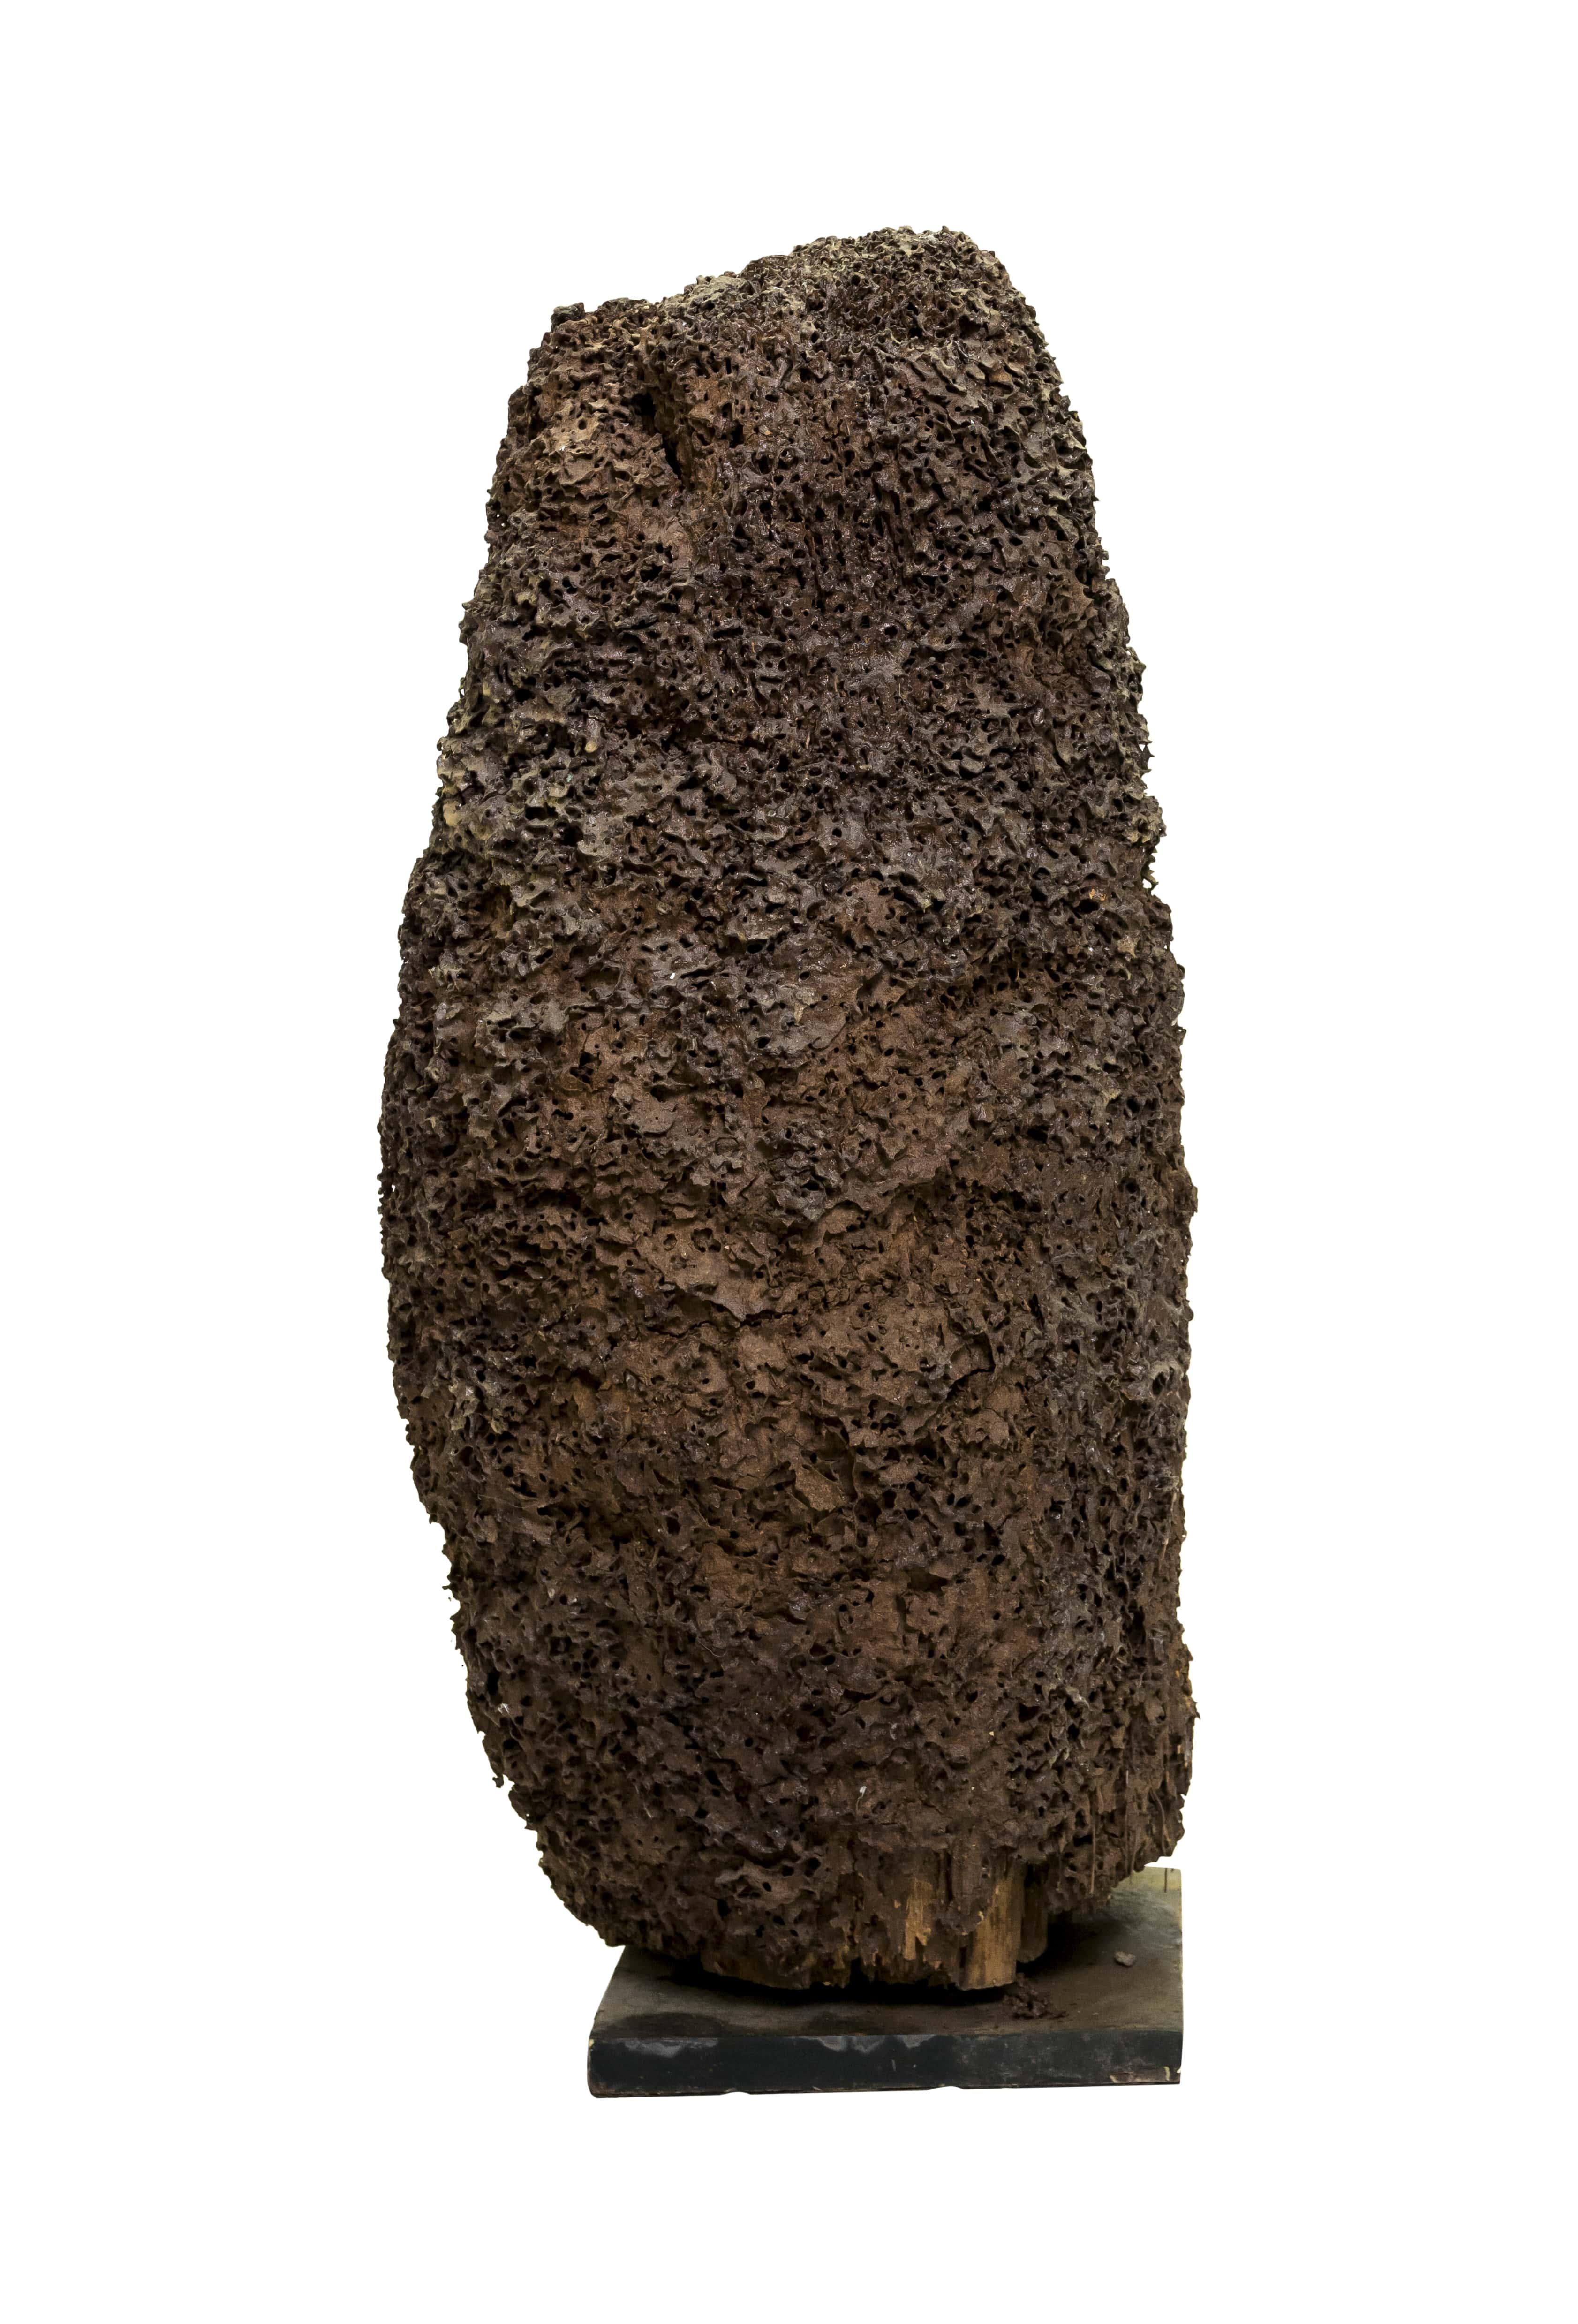 Natural decorative termite sculpture